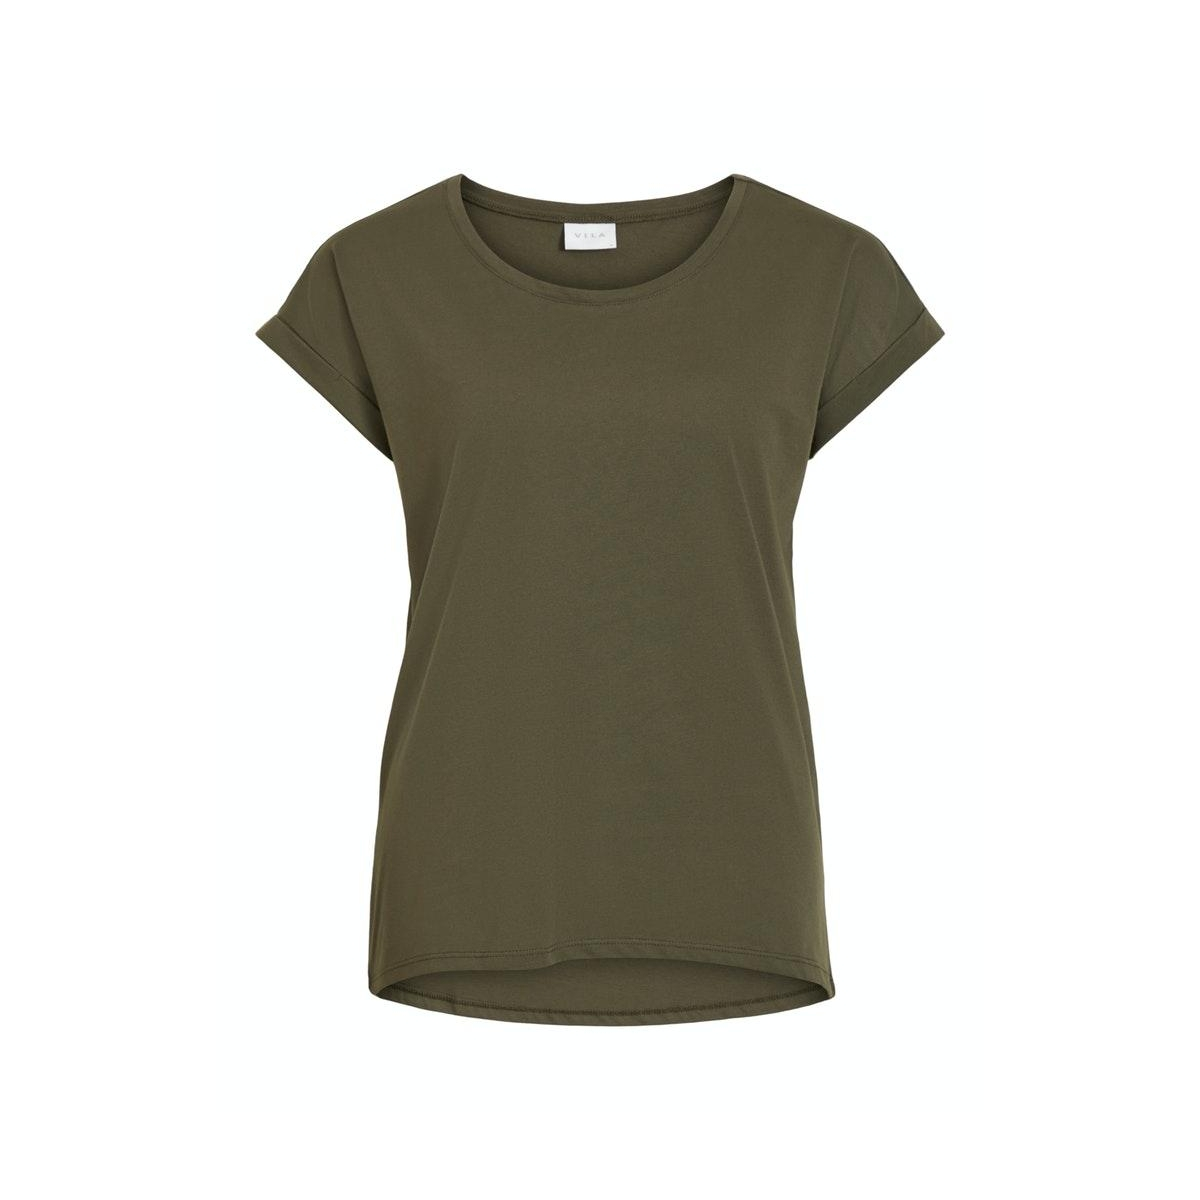 vidreamers pure t-shirt/su-noos 14025668 vila t-shirt forest night